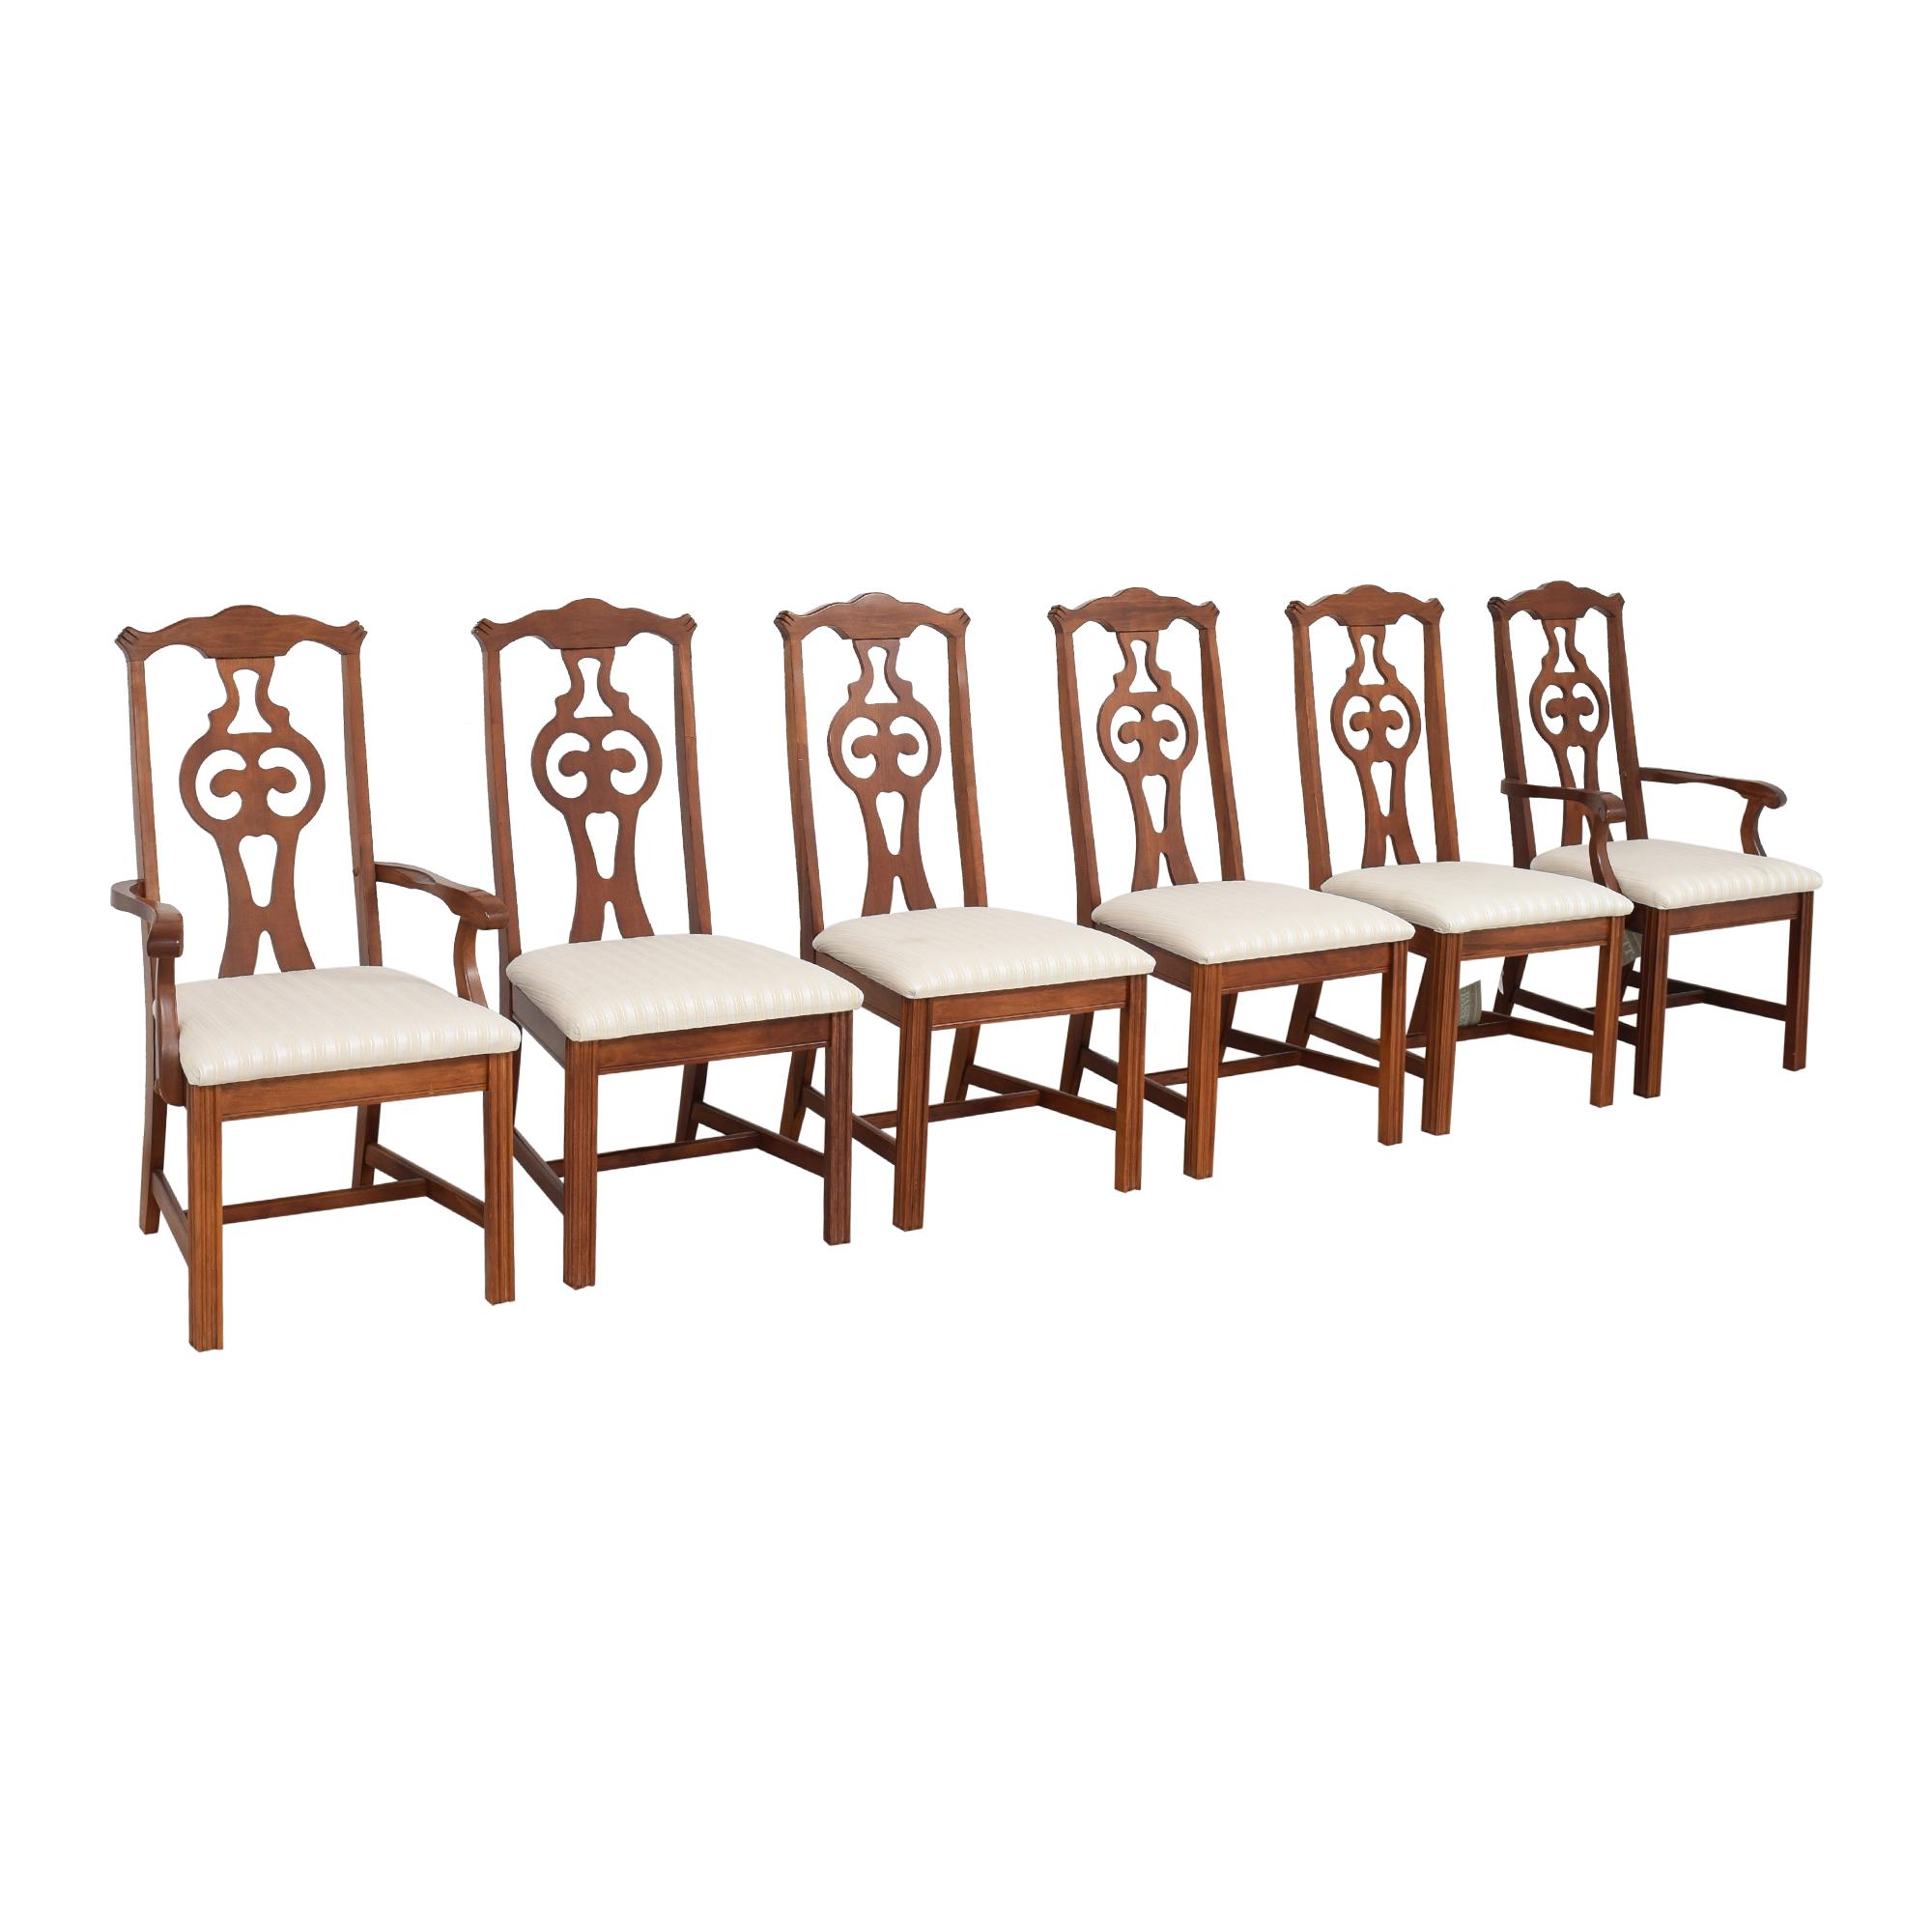 shop Bassett Furniture Upholstered Dining Chairs Bassett Furniture Chairs